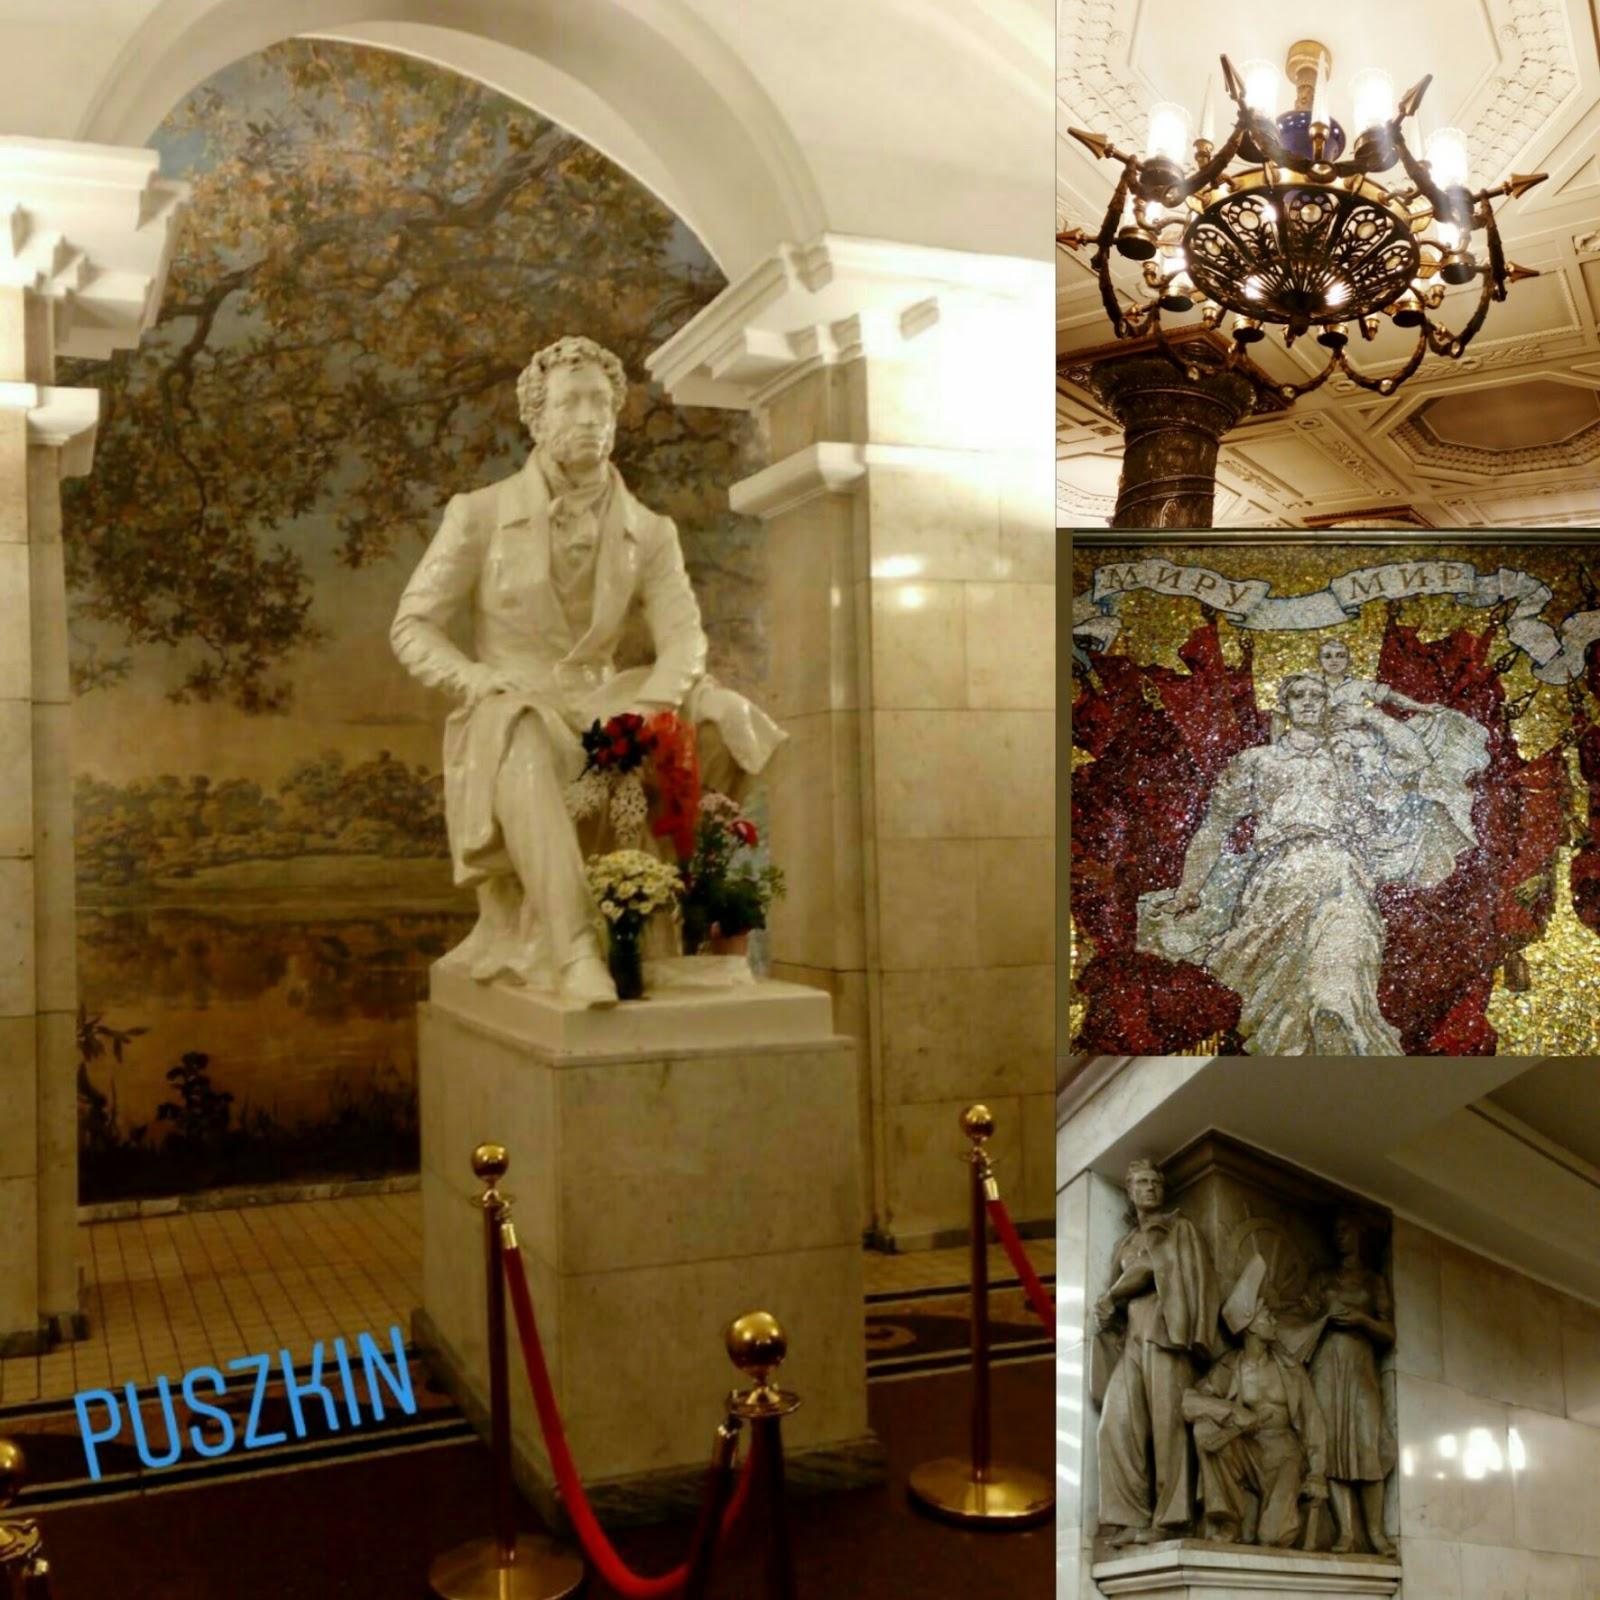 Metro w Petersburgu, bogate stacje metra